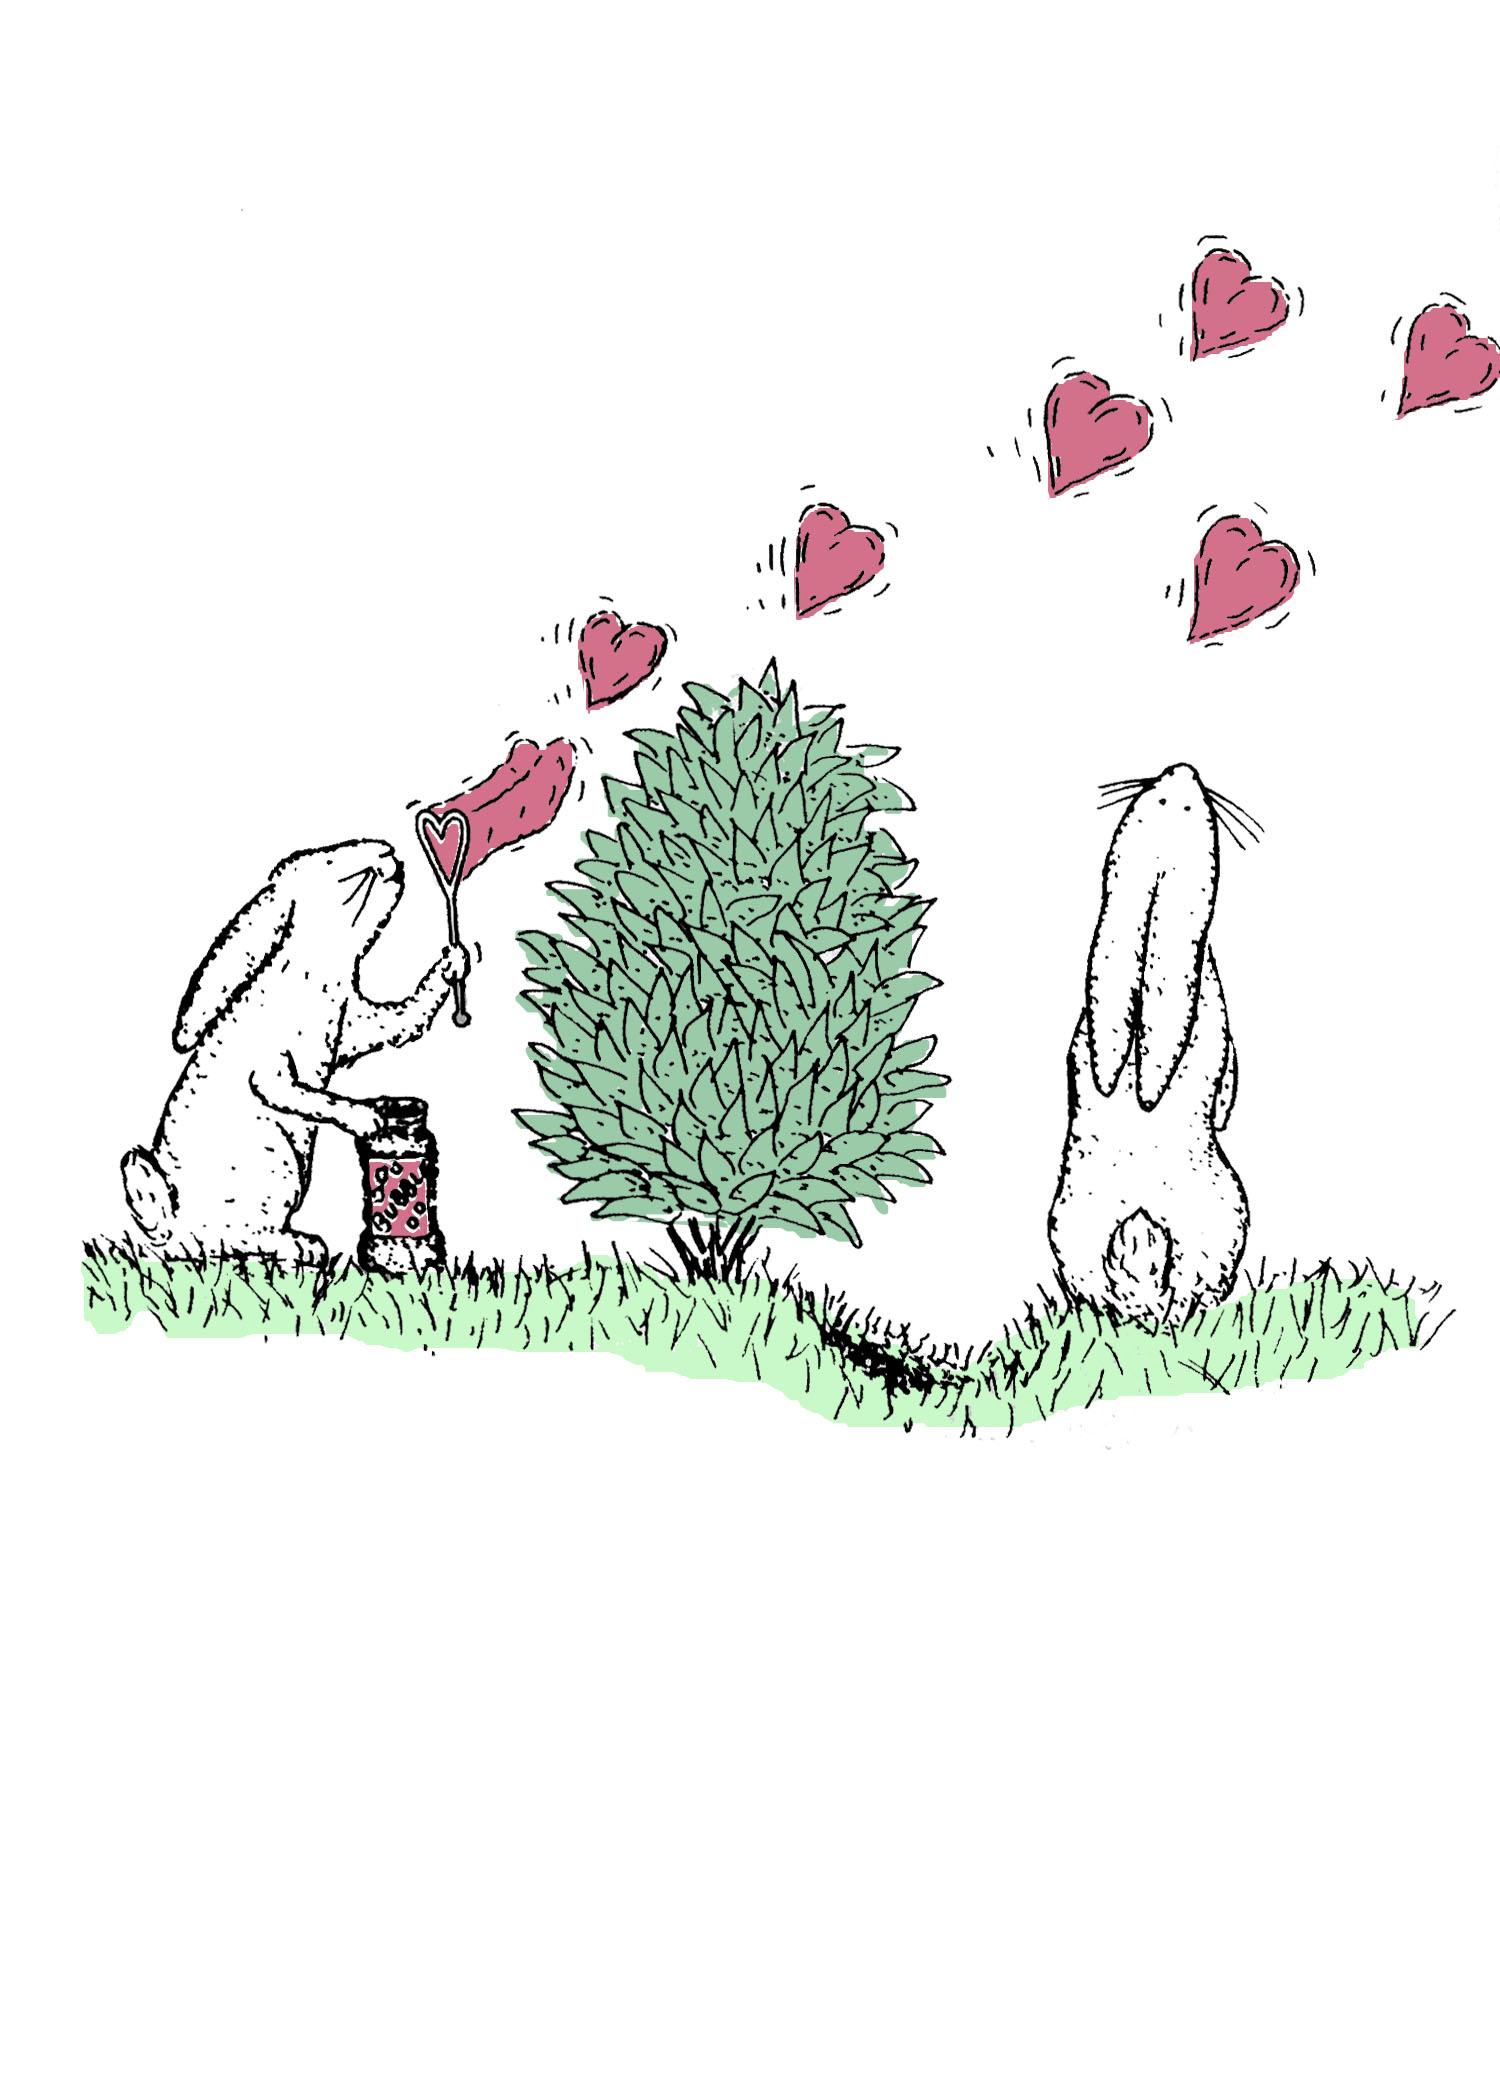 Bunny Bubbles, illustration by David DeWitt